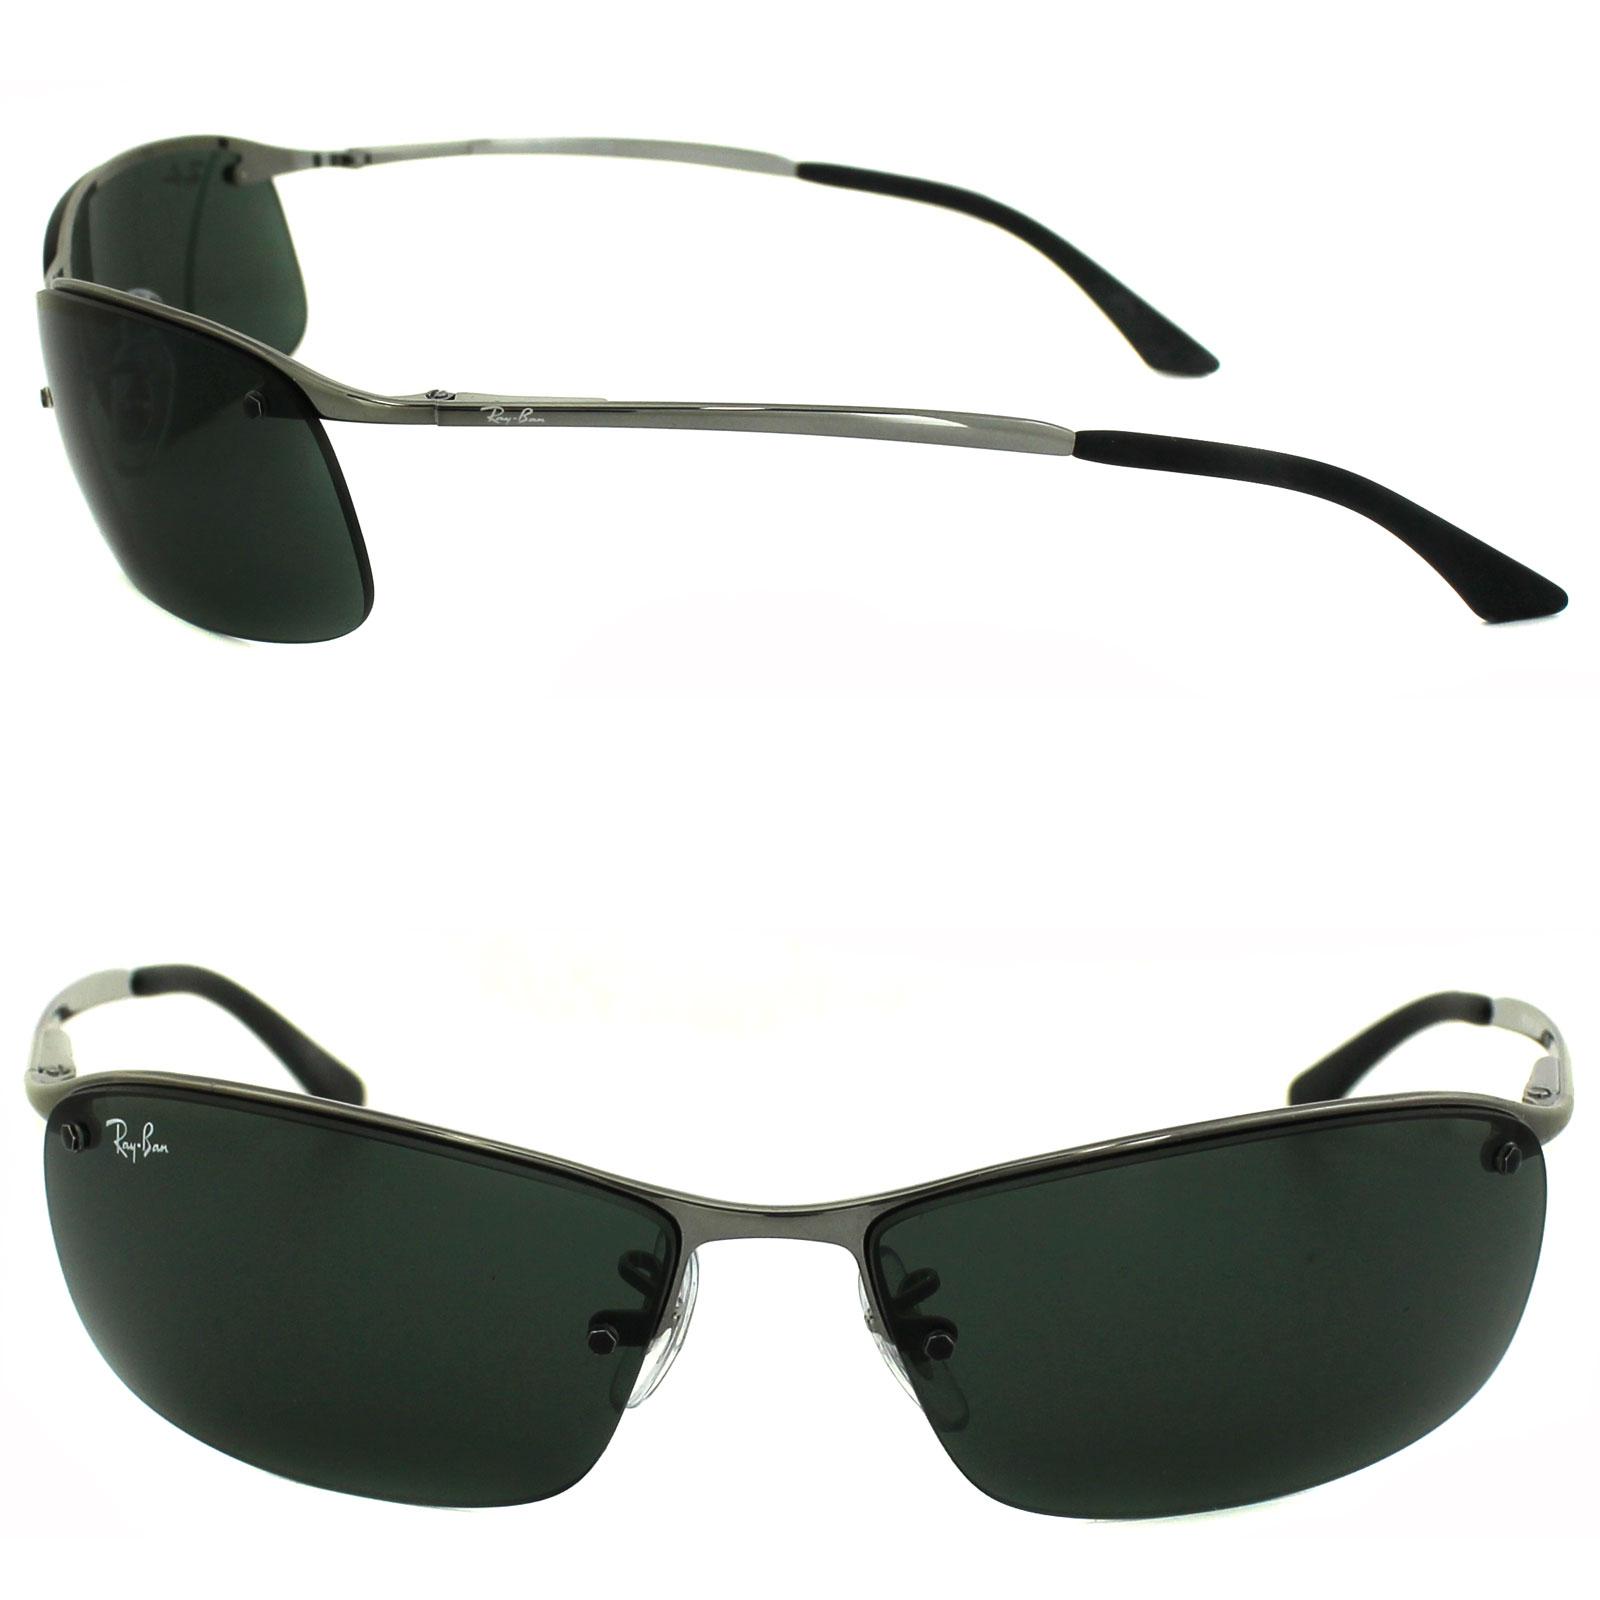 Cheap Ray Ban Top Bar 3183 Sunglasses Discounted Sunglasses